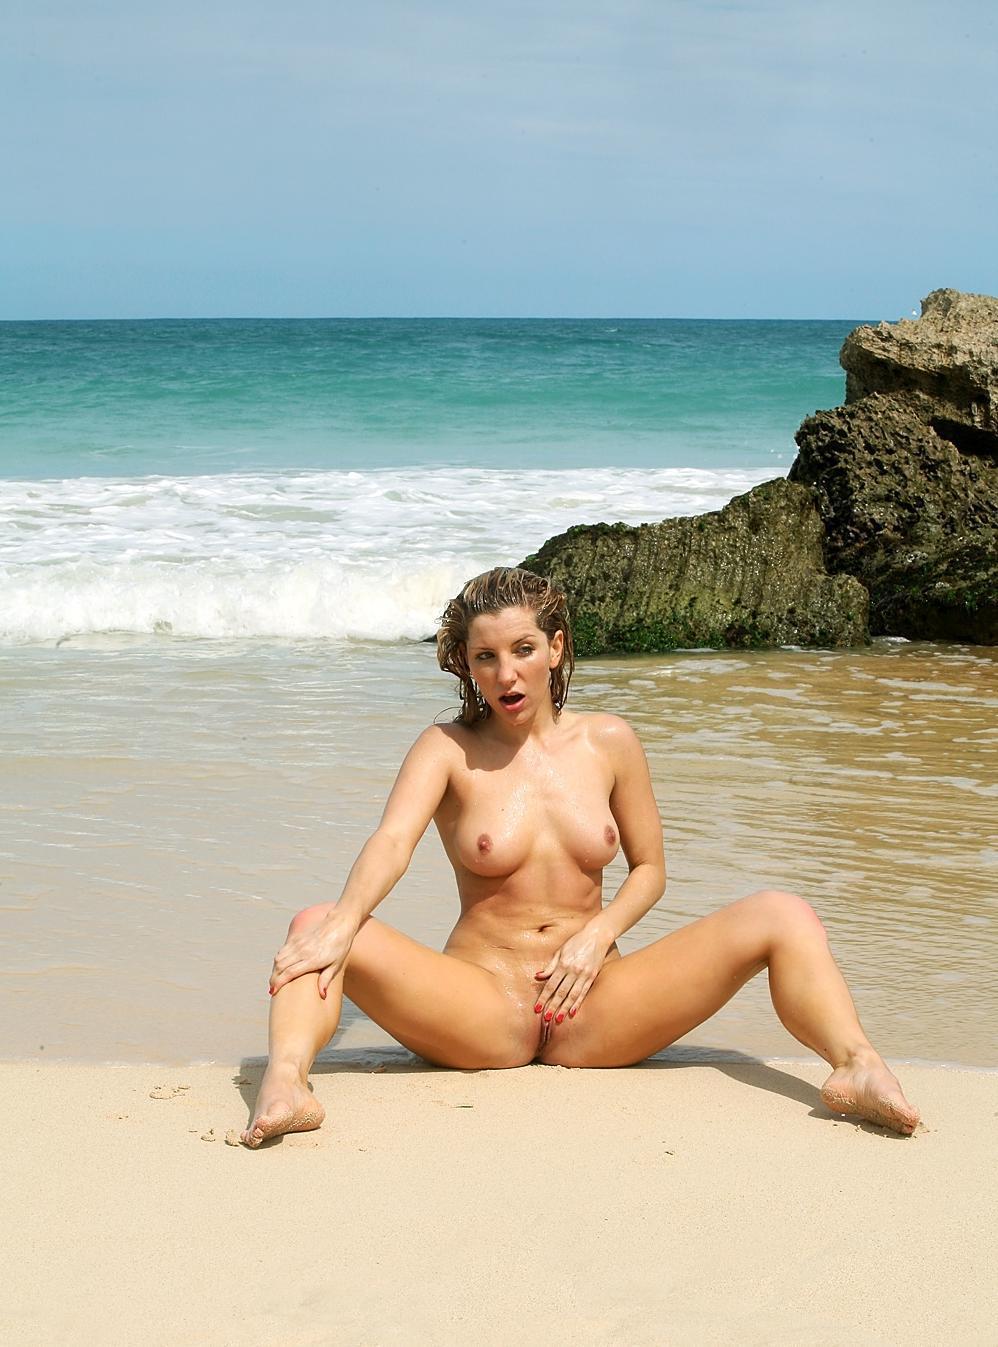 Ryan newman naked gifs